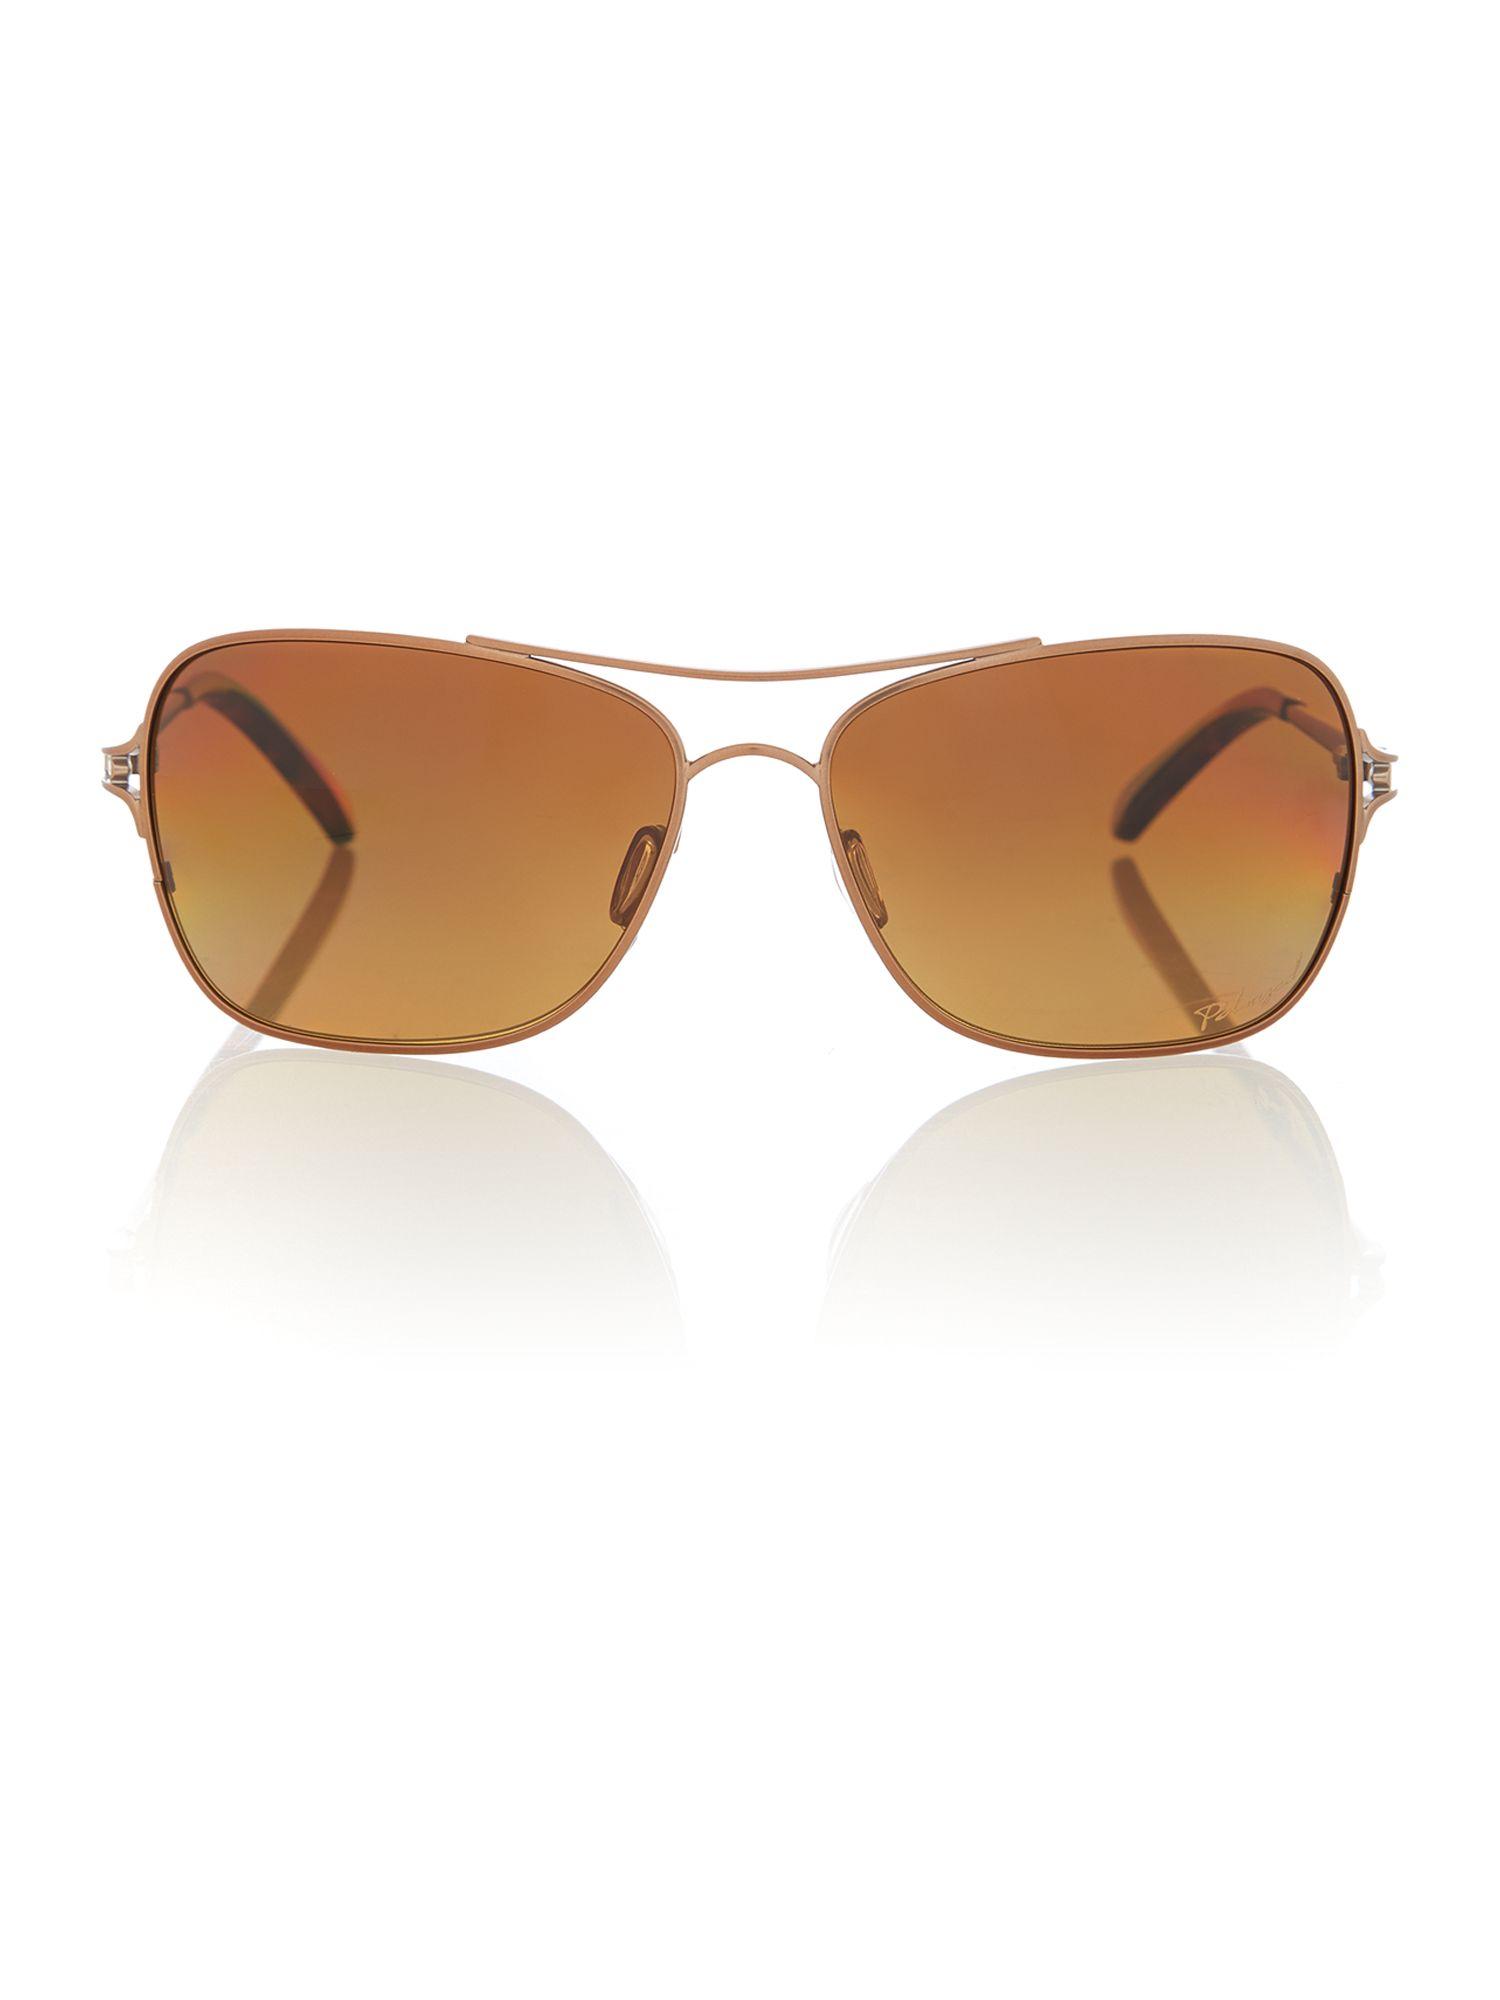 8190053ba93 Oakley Sunglasses Brown Pilot « Heritage Malta